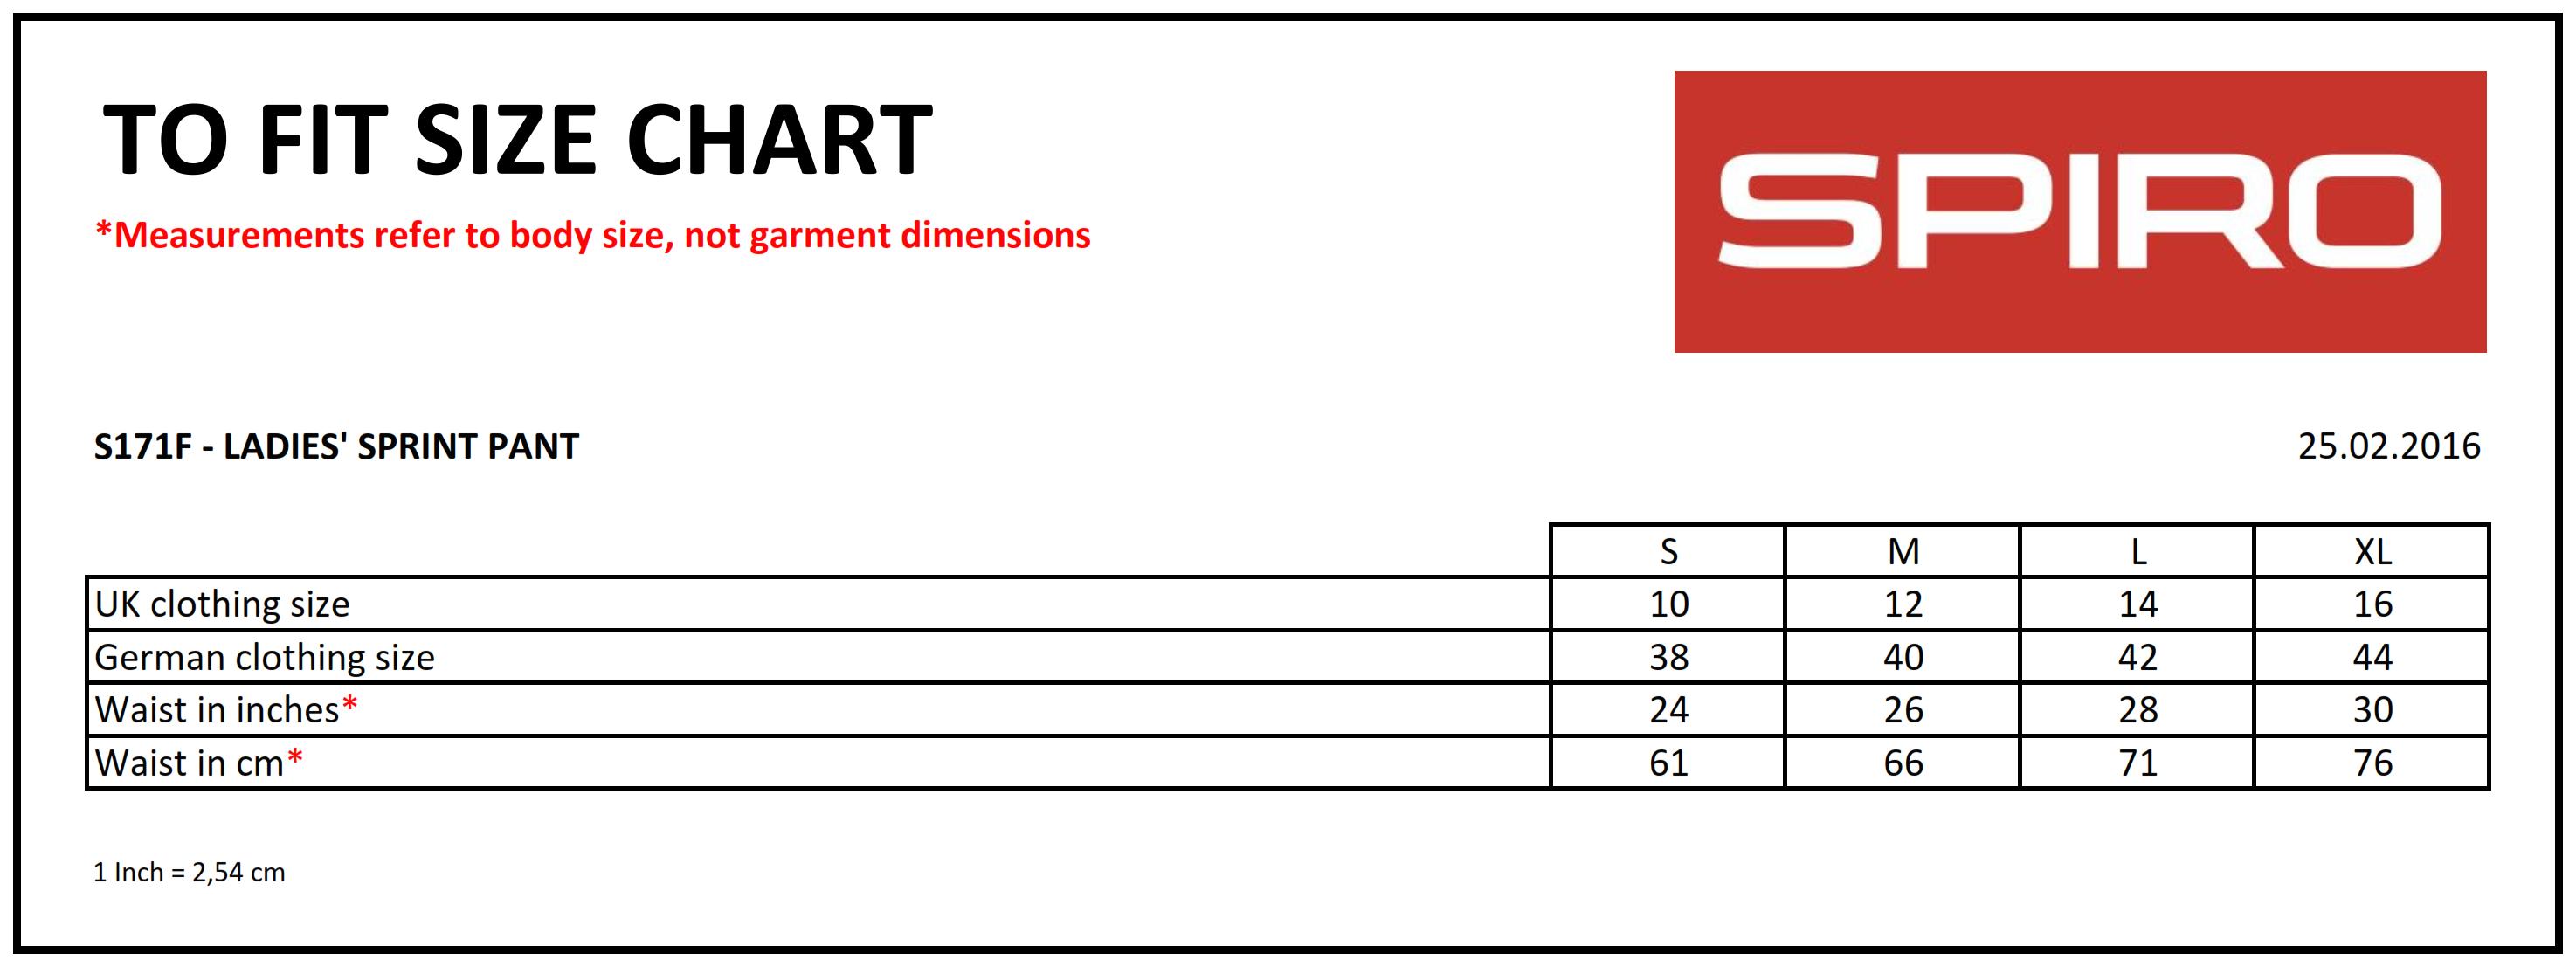 Result: Ladies` Spiro Sprint Pant R171F